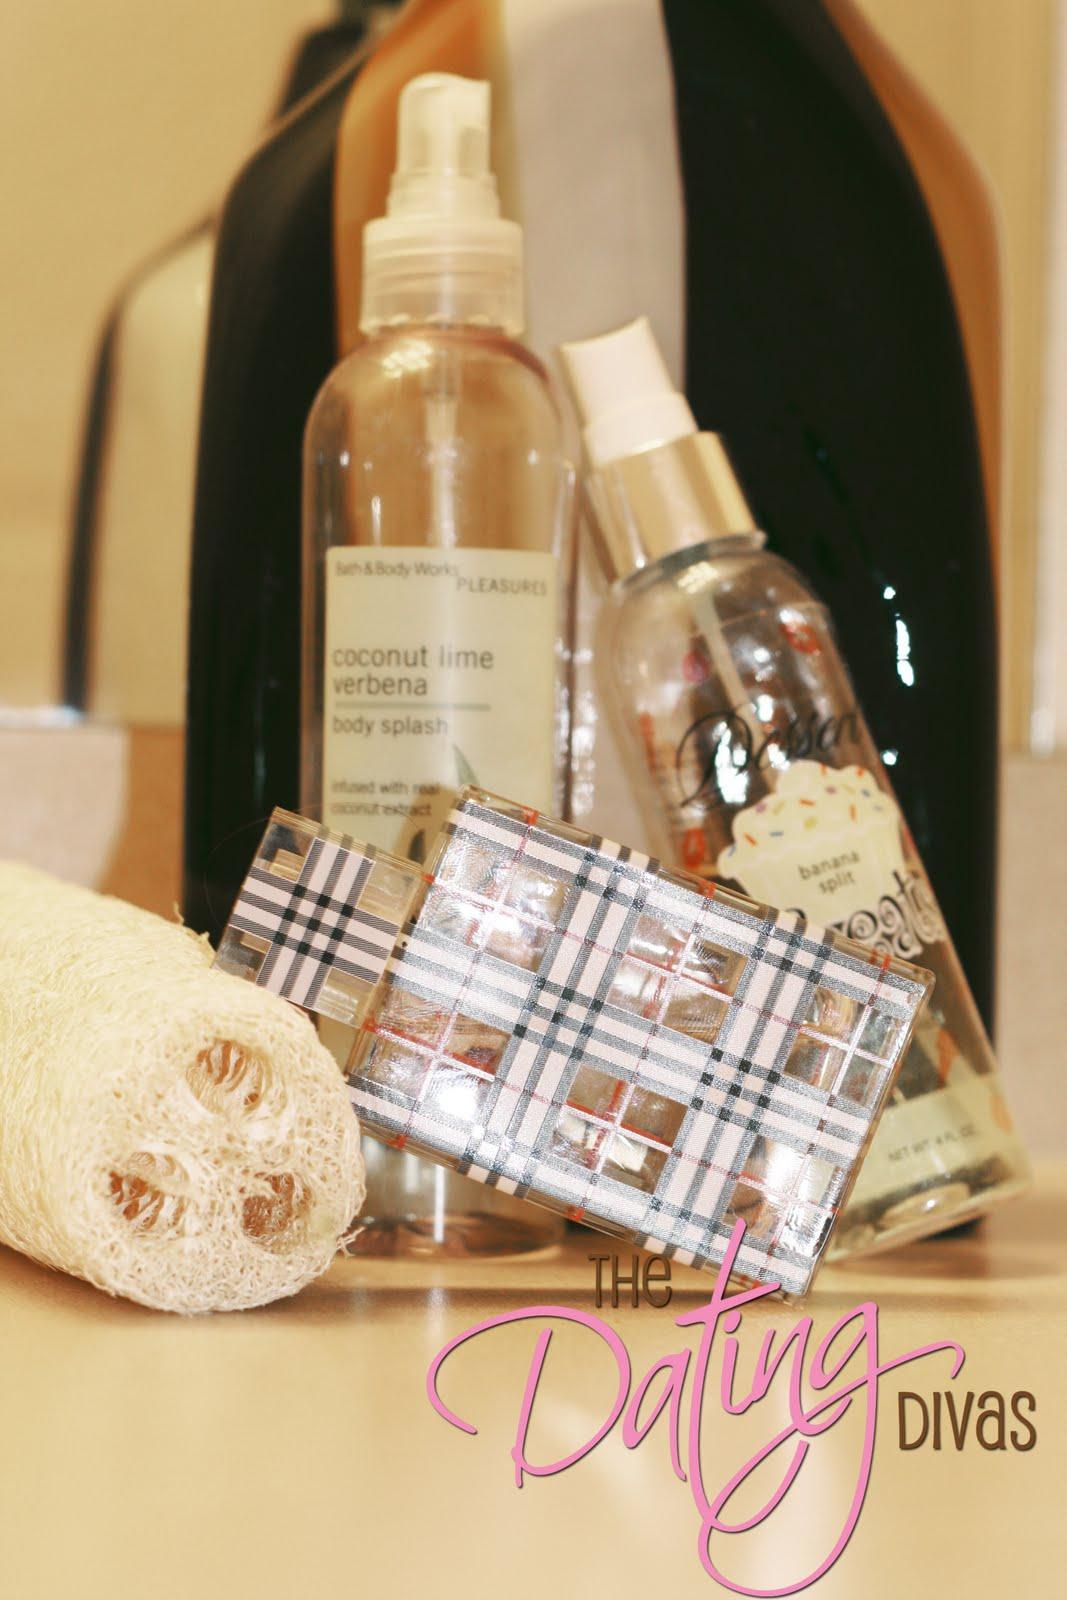 http://2.bp.blogspot.com/_U8zifEqy4-4/TIJoKqtTmWI/AAAAAAAACCk/cko9rIdn9Bk/s1600/My+perfume.jpg